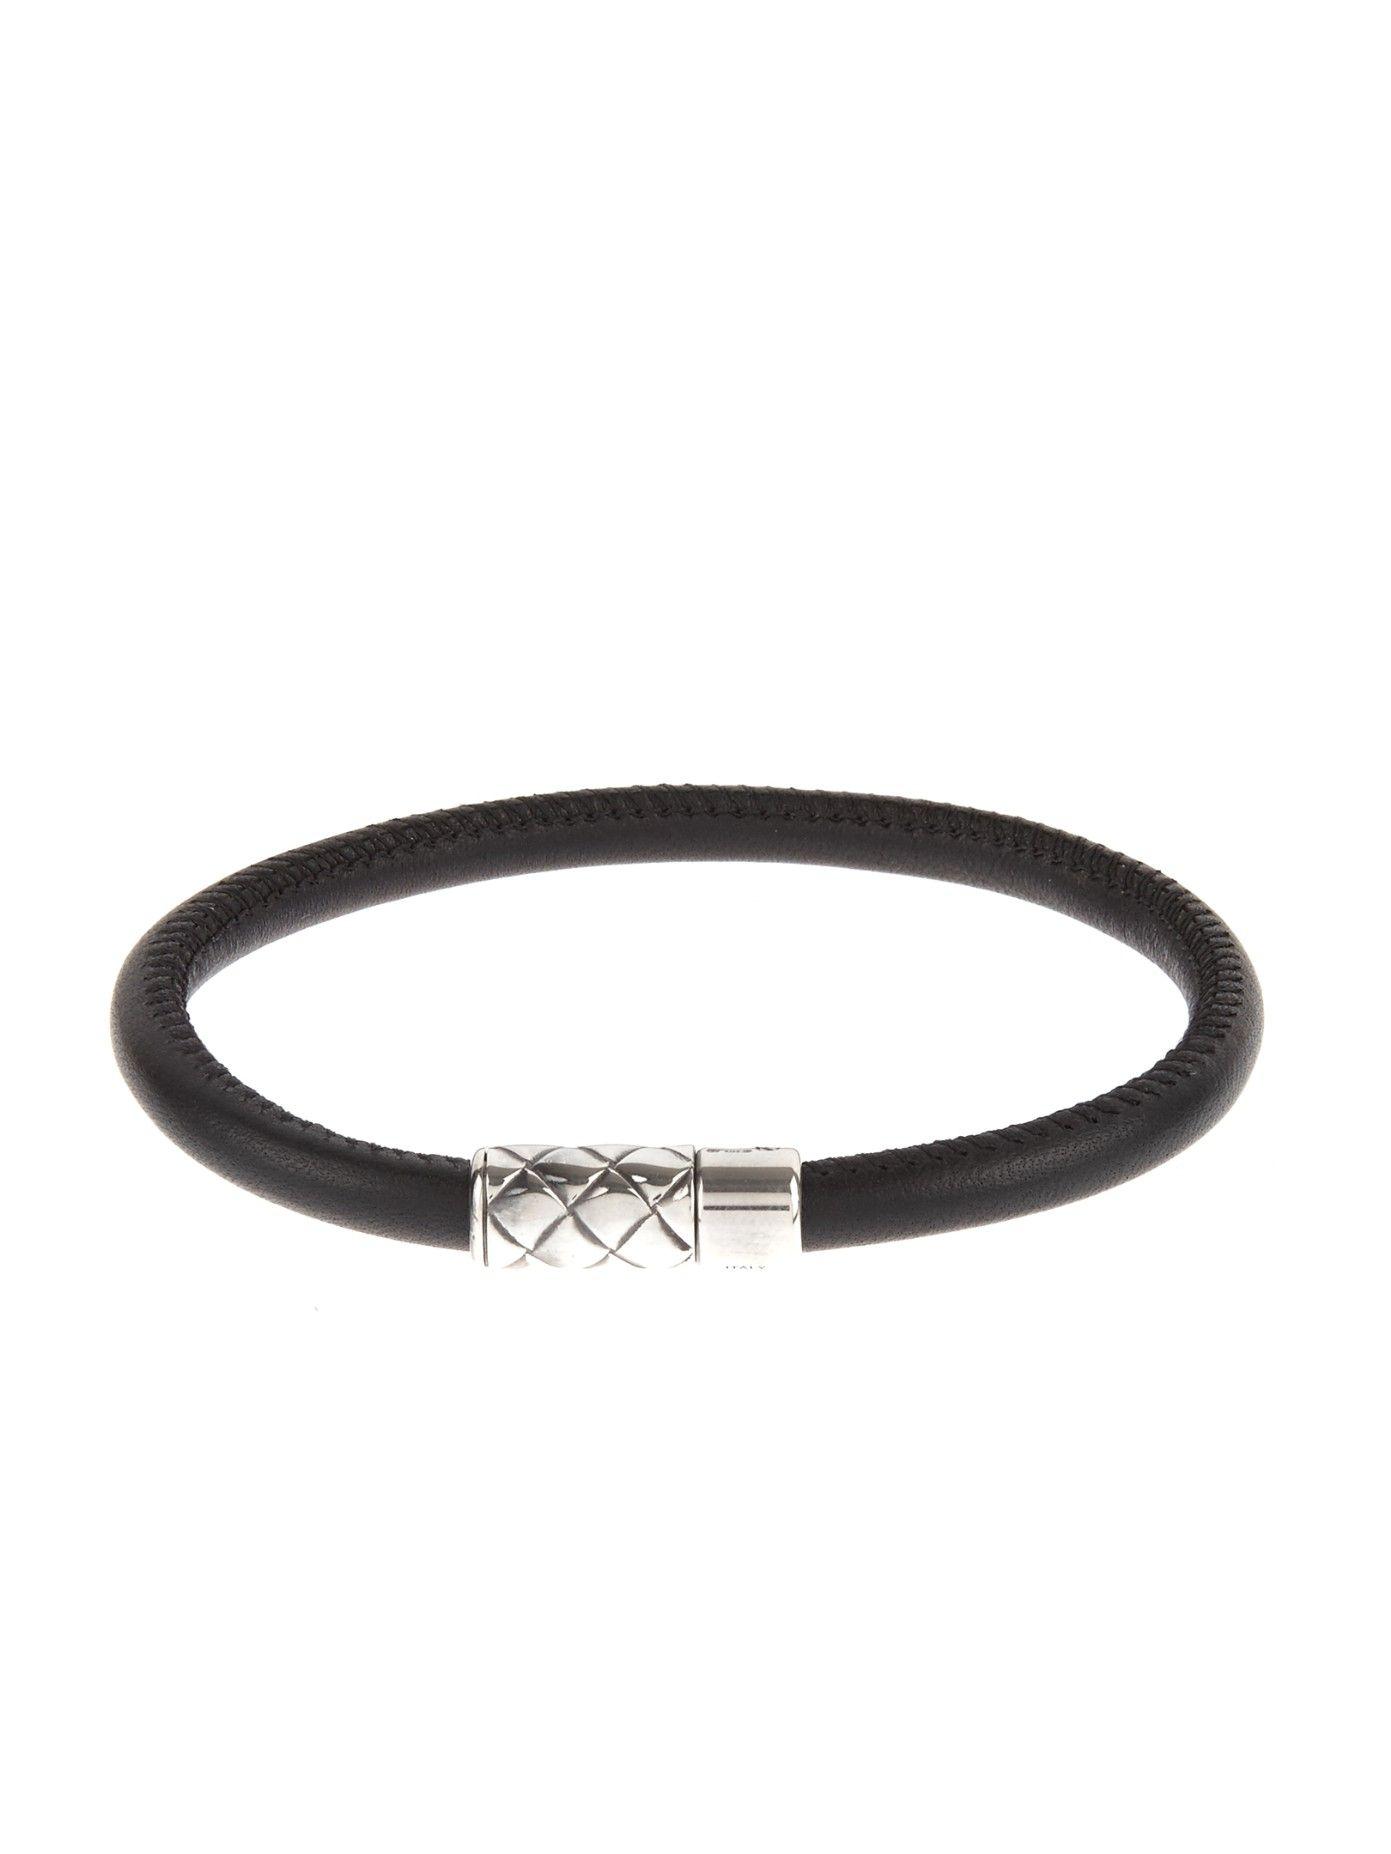 Magnetic leather bracelet by bottega veneta shop now at